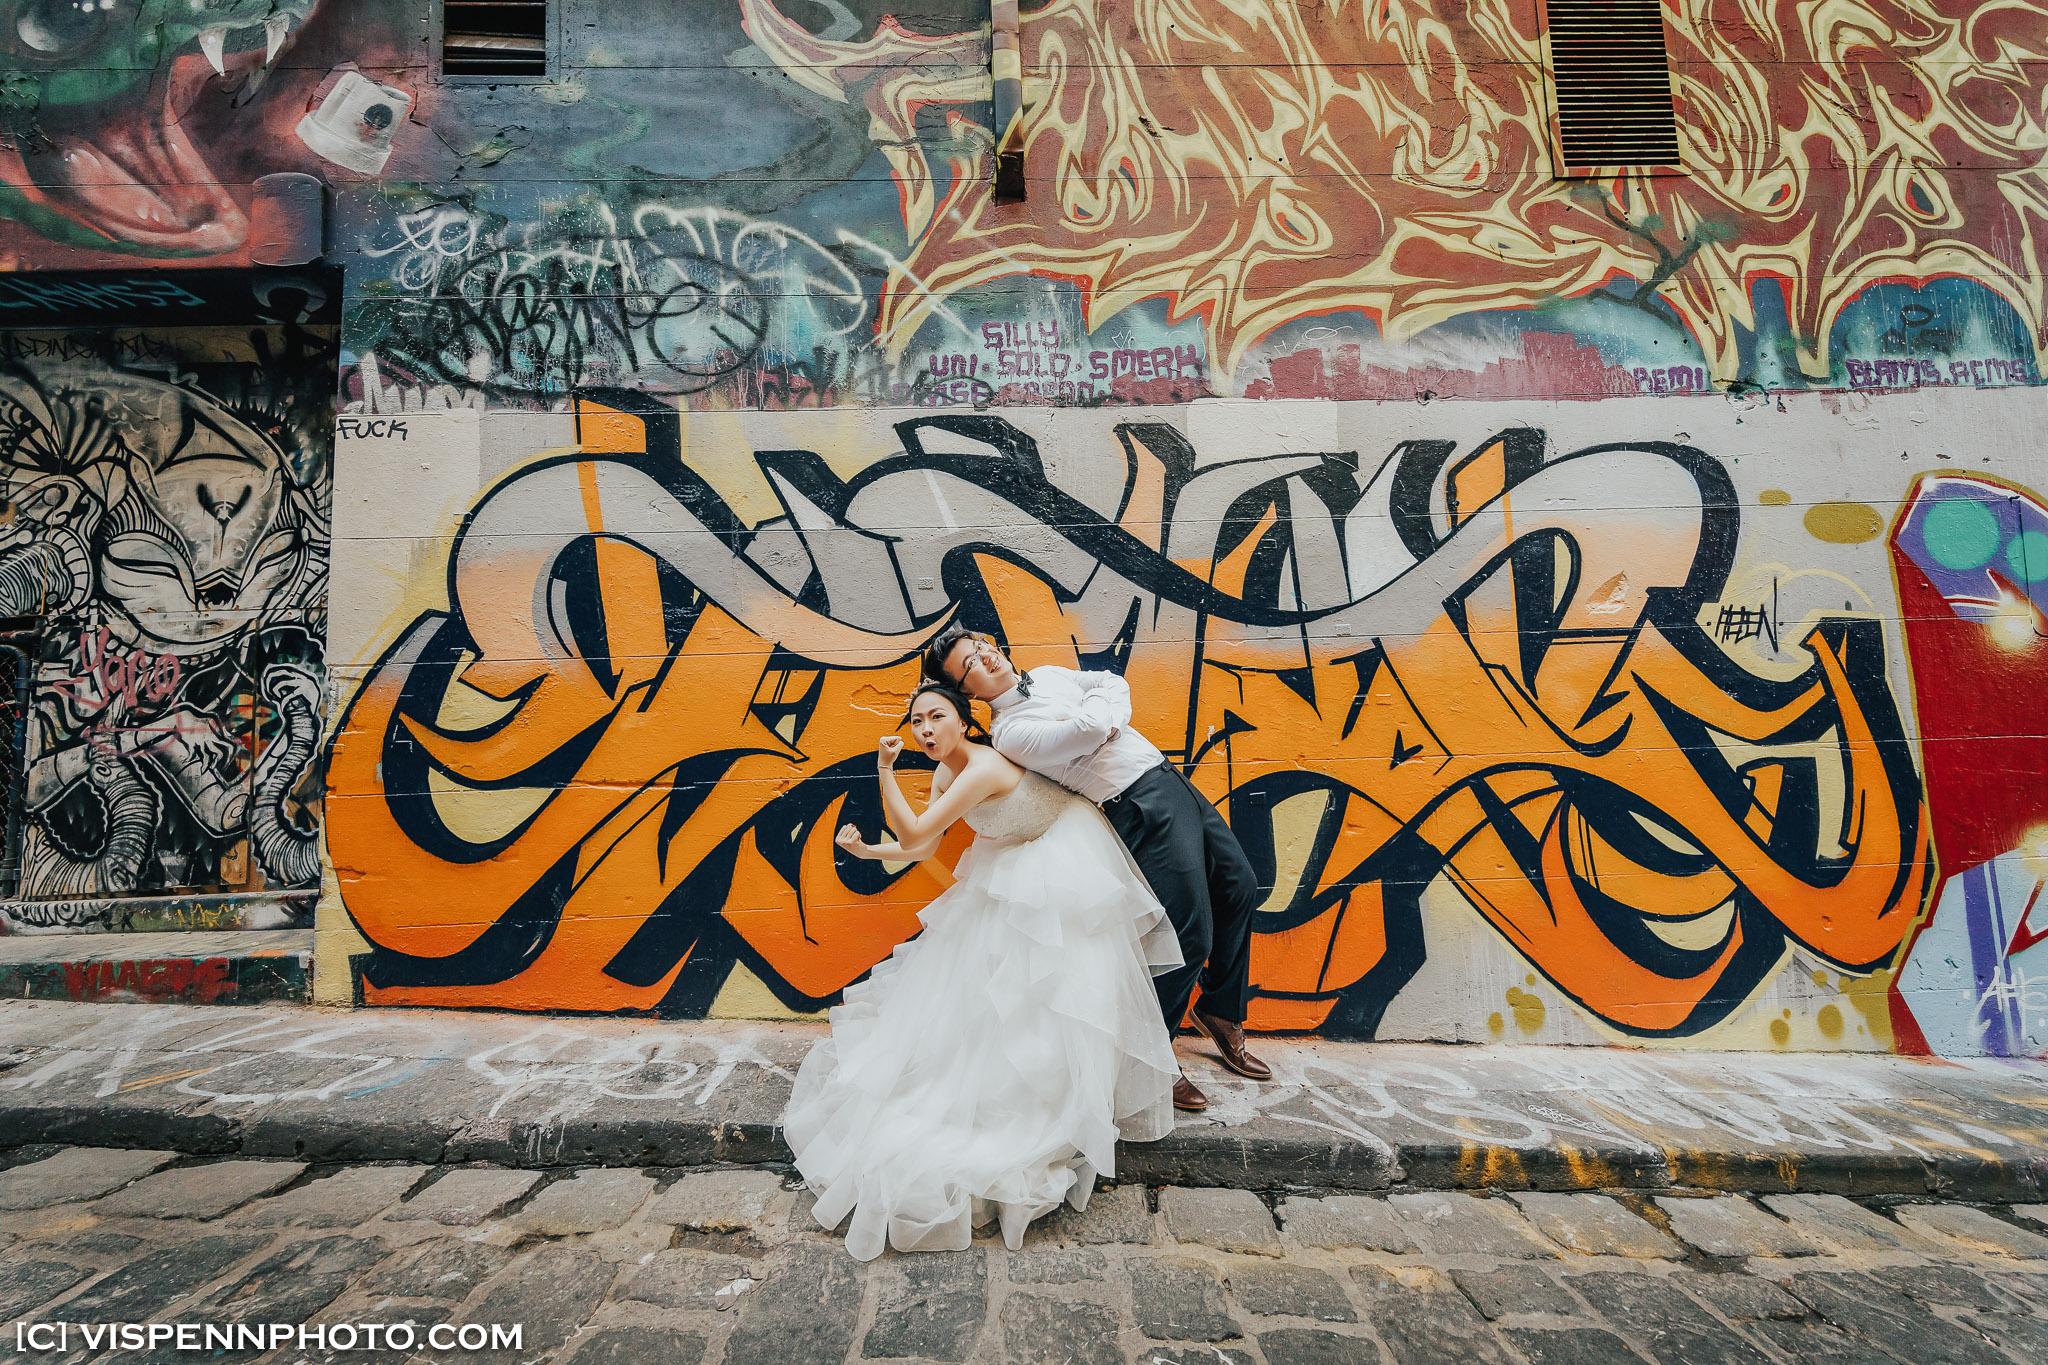 PRE WEDDING Photography Melbourne VISPENN 墨尔本 婚纱照 结婚照 婚纱摄影 VISPENN NieQY P 3444